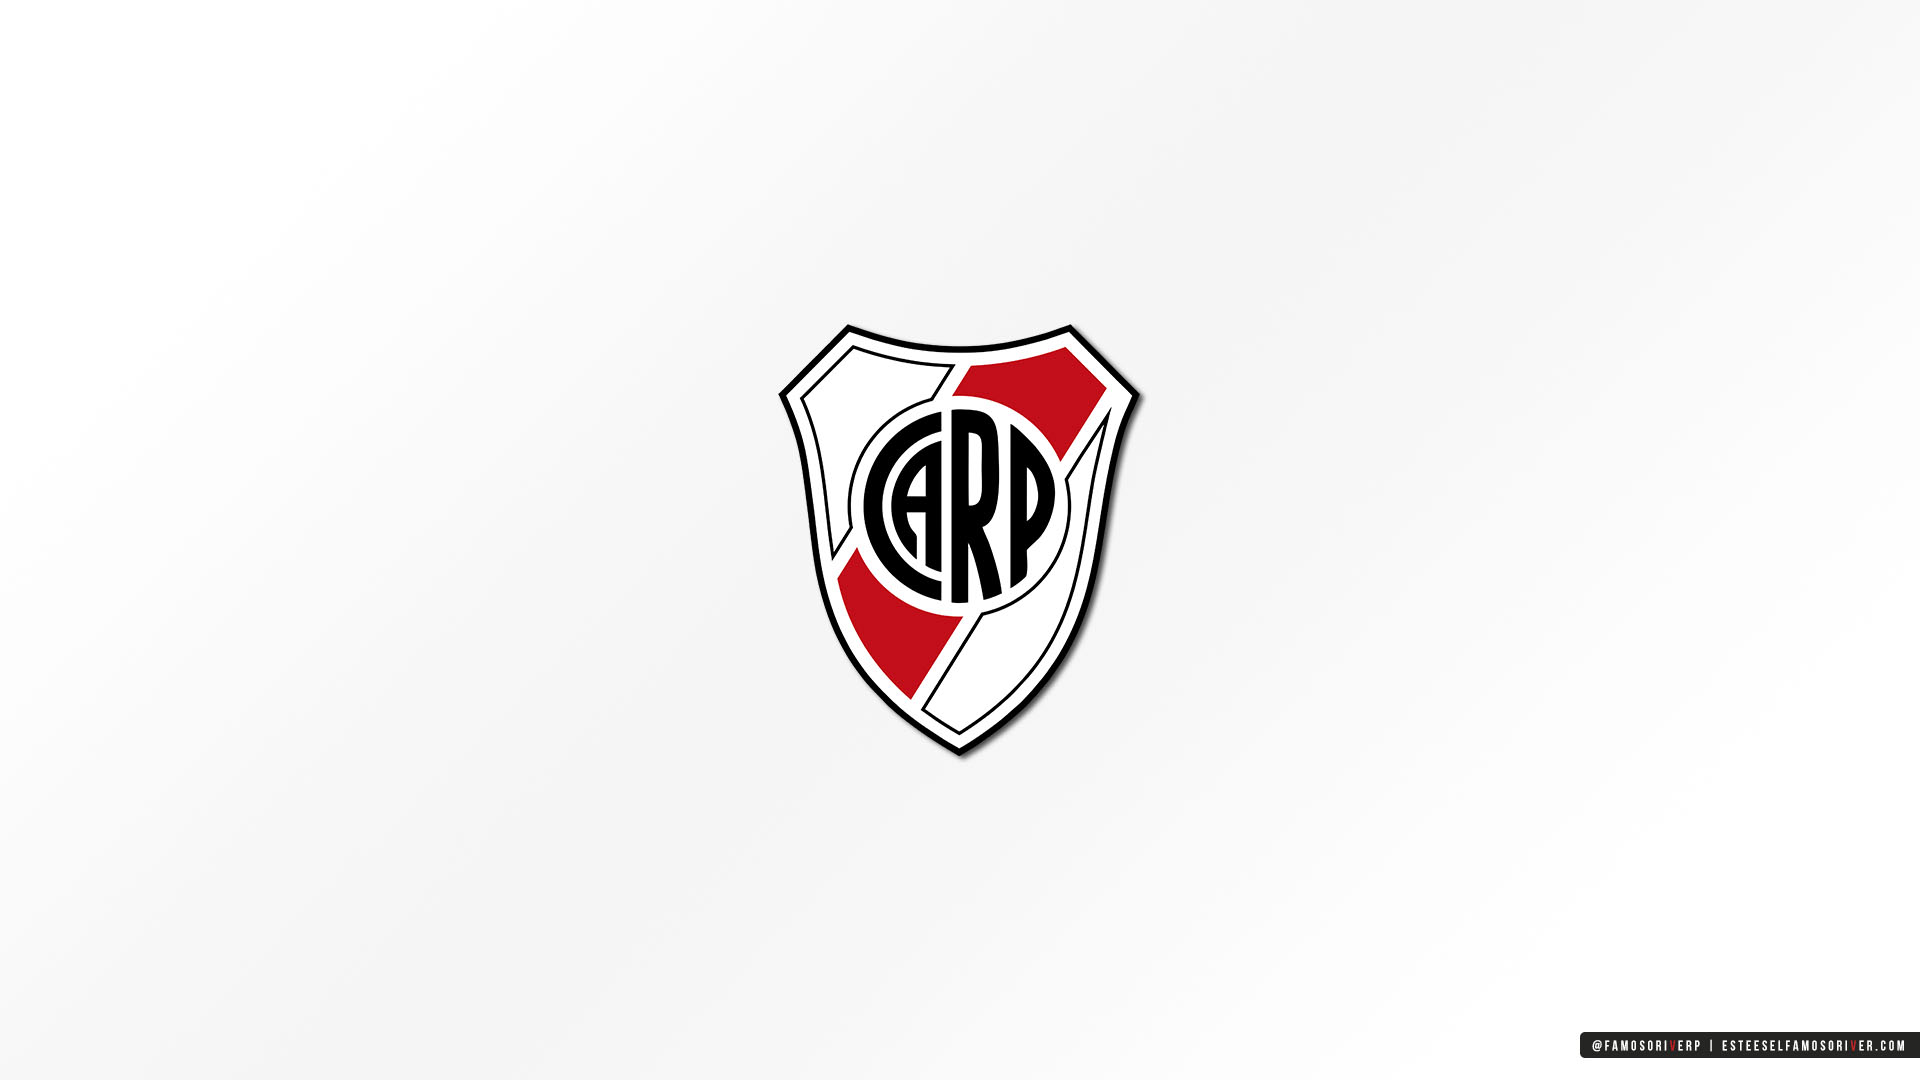 imagenes-de-River-Plate-para-fondos-de-pantalla-wallpaper-de-River-Escudo River Plate - Fondo blanco